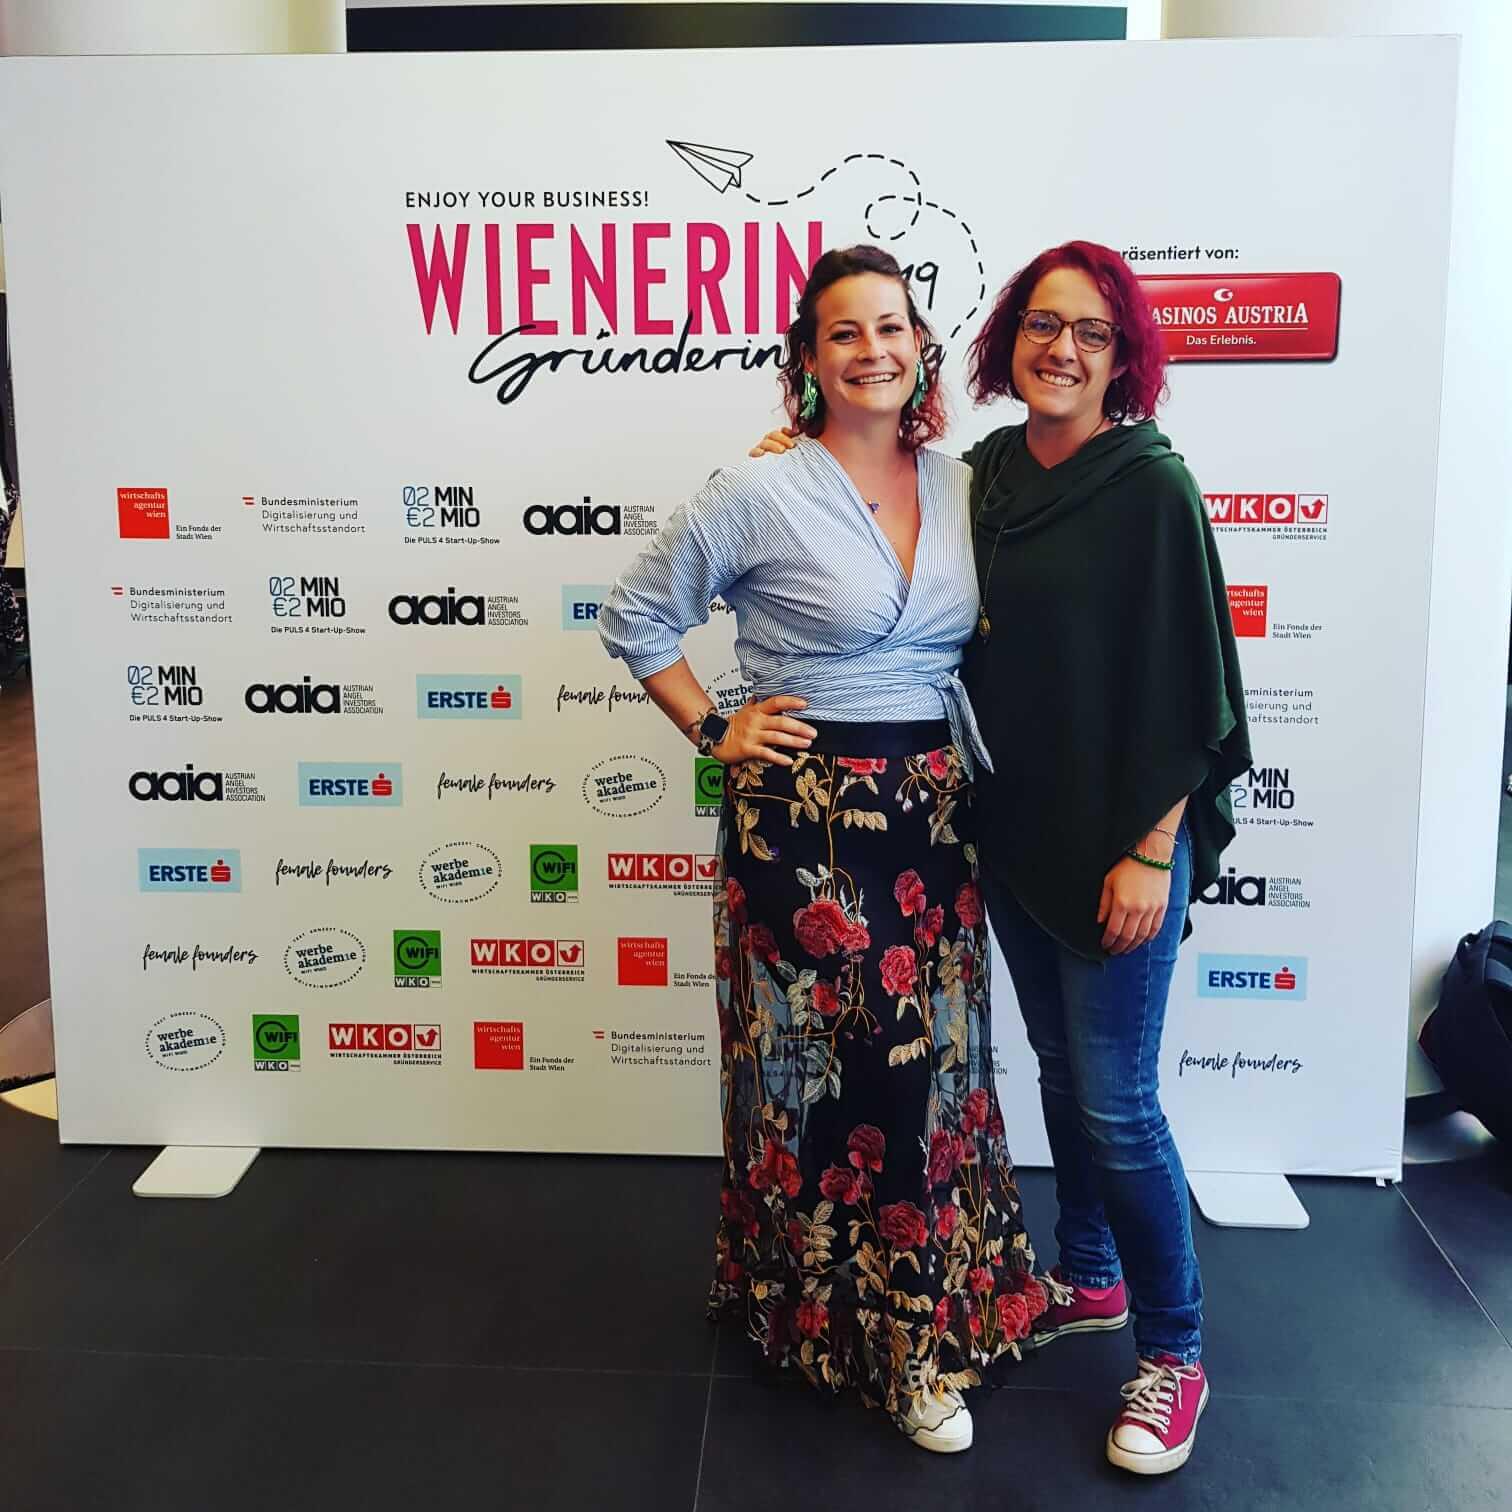 gemeinsam statt einsam, Netzwerk, Karina Streng, Wienerin Gründerinnentag, Doris Wansch, Lebensfreude Praxis